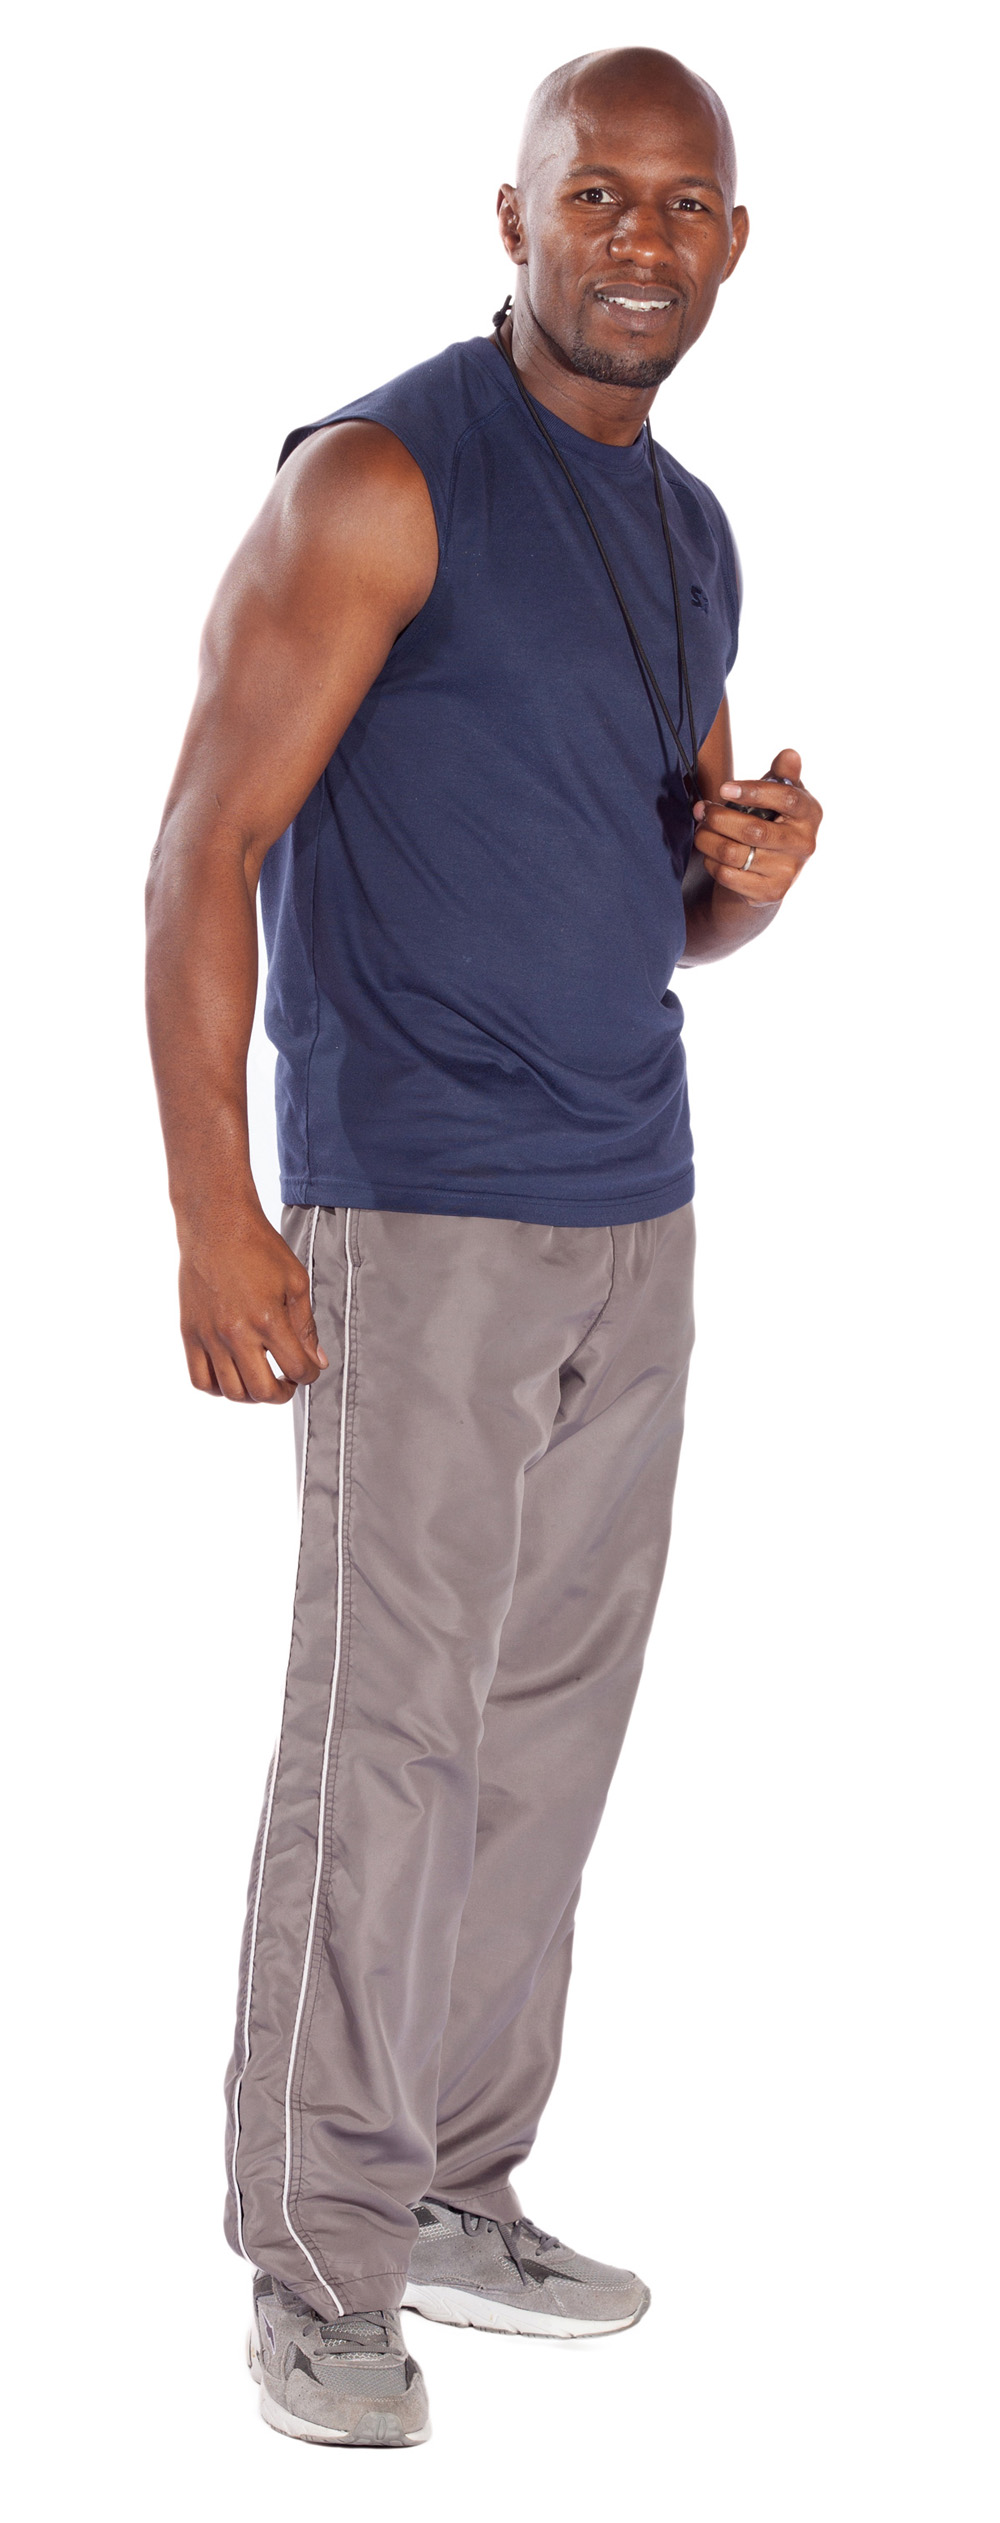 michael-flannagan-40-below-fitness-center-fairbanks-ak-035-web.jpg